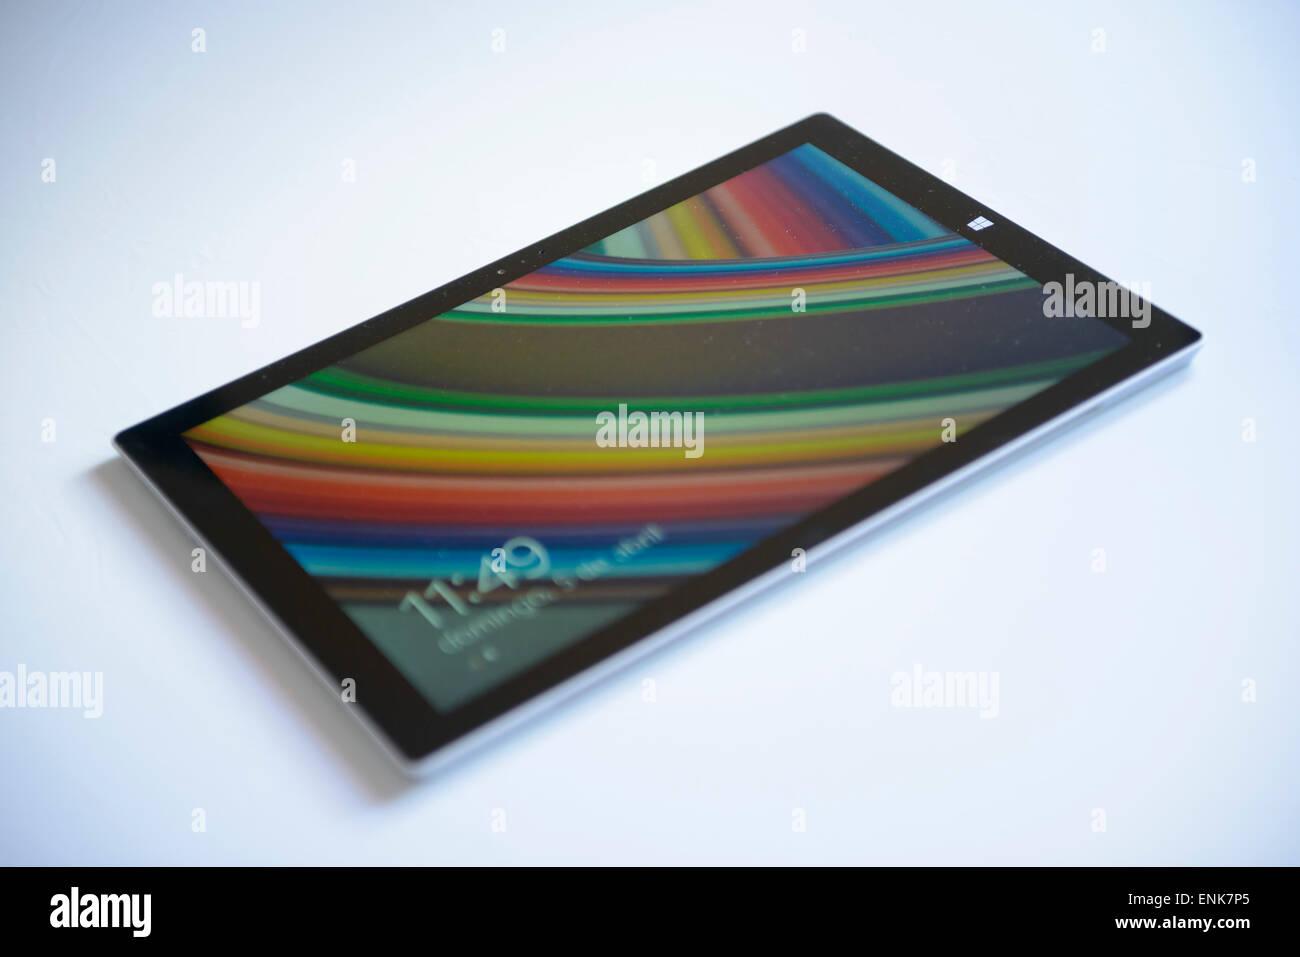 Microsoft Surface Pro 3 PC tablet pc recorte aislado sobre fondo blanco. Imagen De Stock